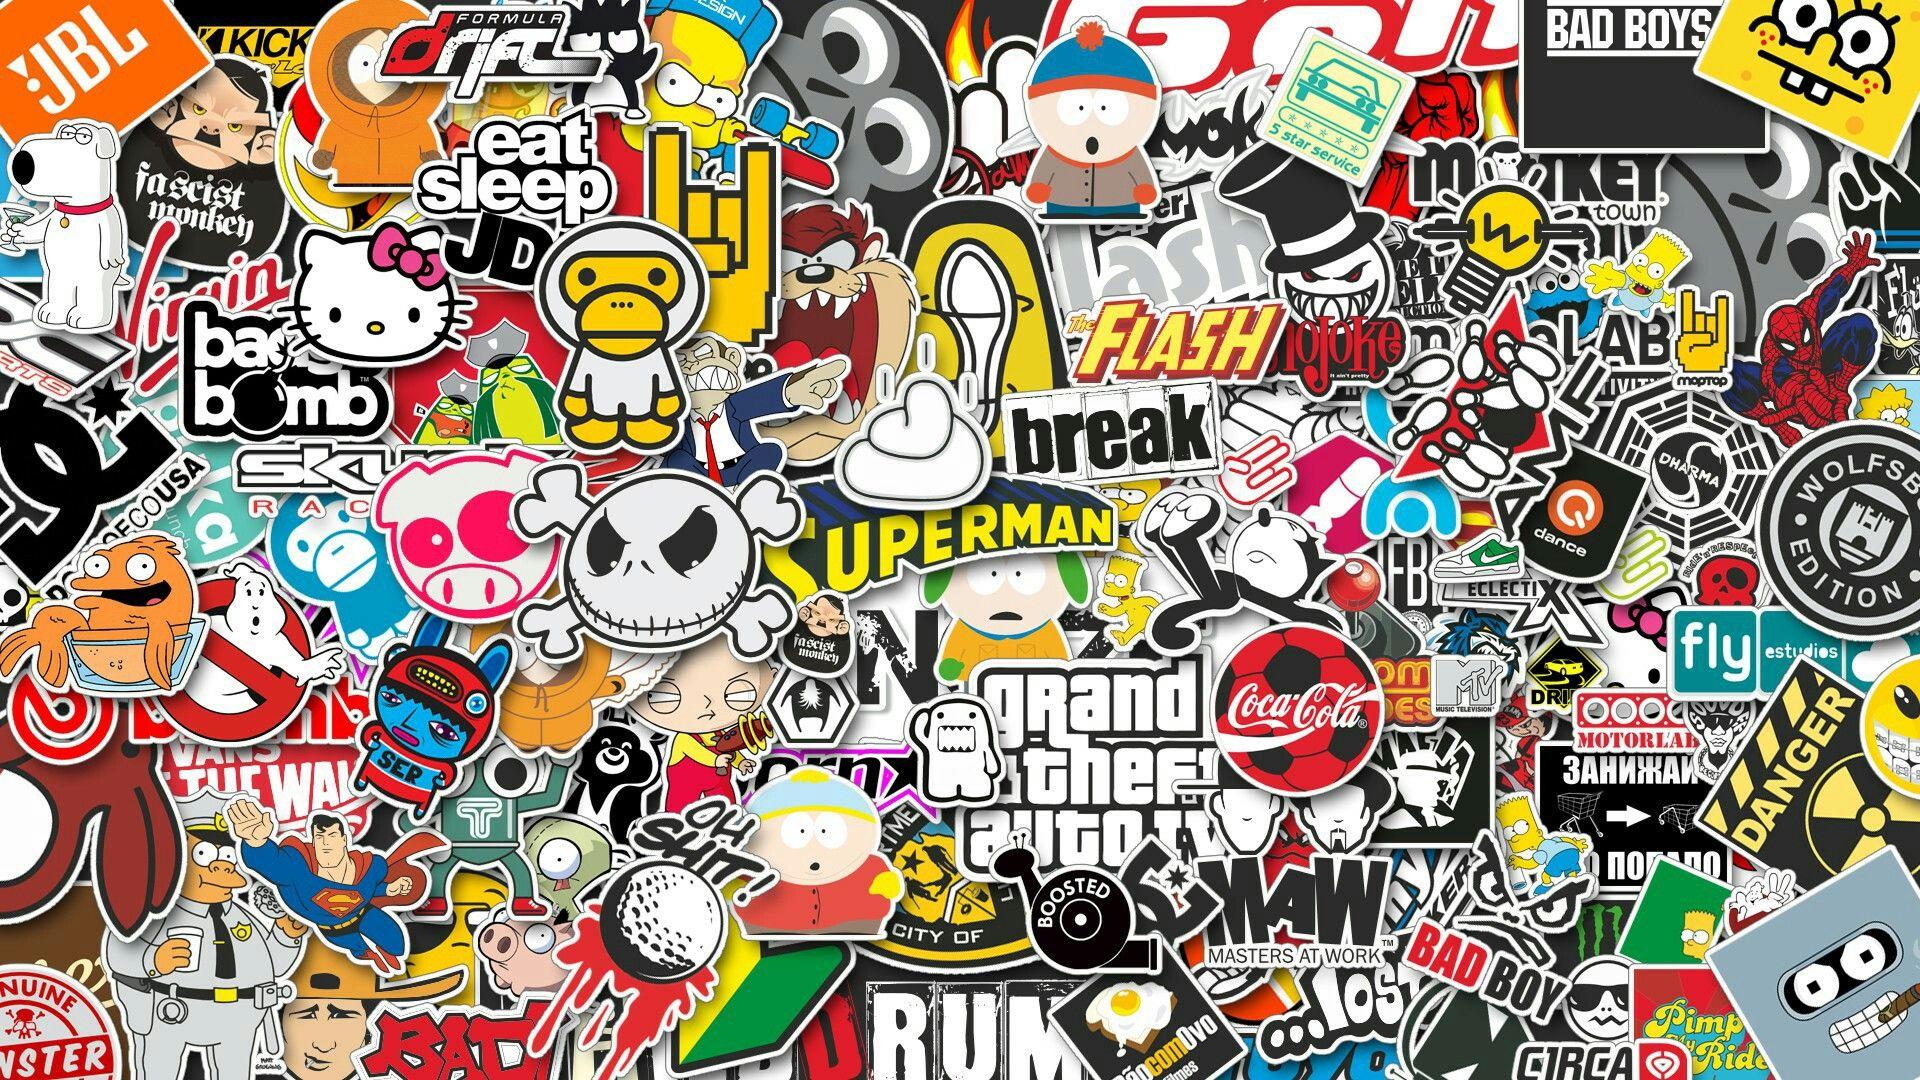 Jdm stickers bumper stickers free stickers custom stickers sticker vinyl vinyl